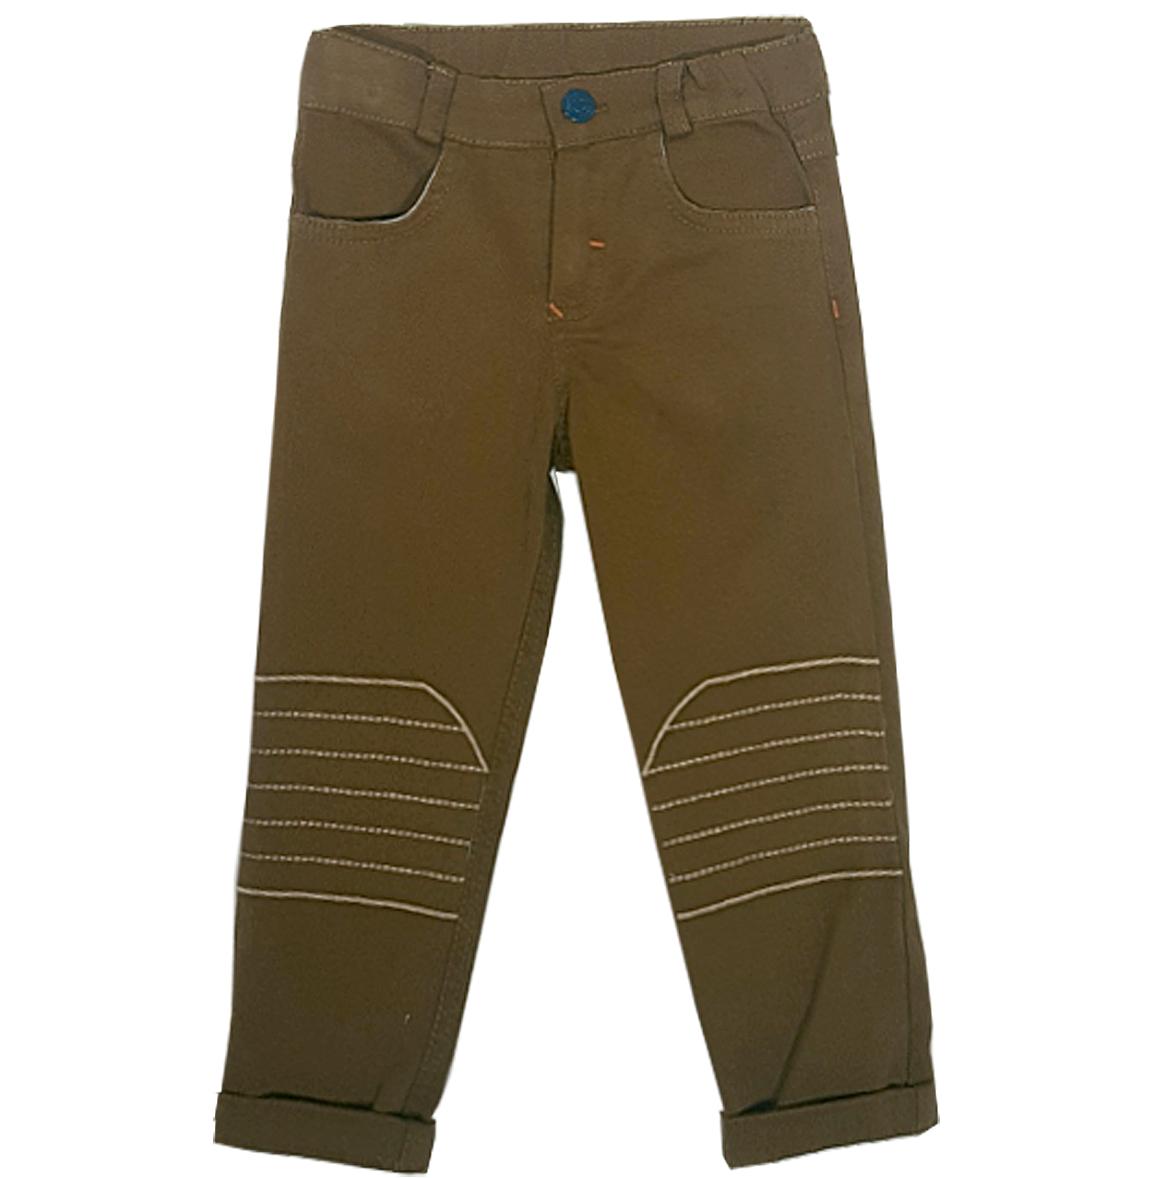 e87d11021a9 Παιδικά παντελόνια για αγόρια